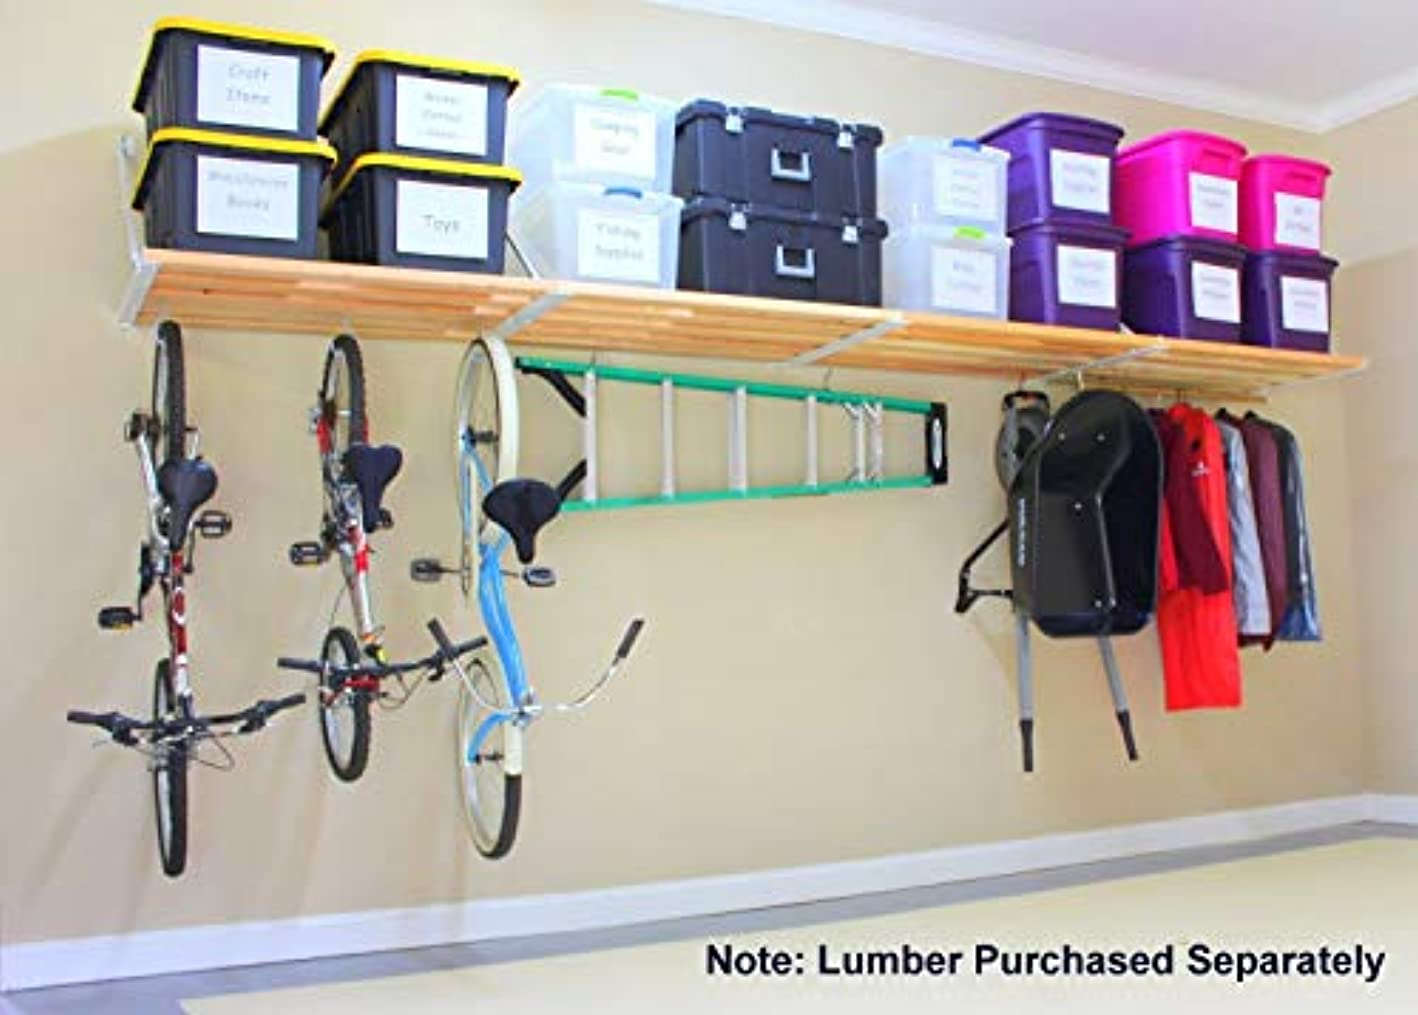 DIY Rhino Shelf Garage Shelves (16 Foot Length, 33.5